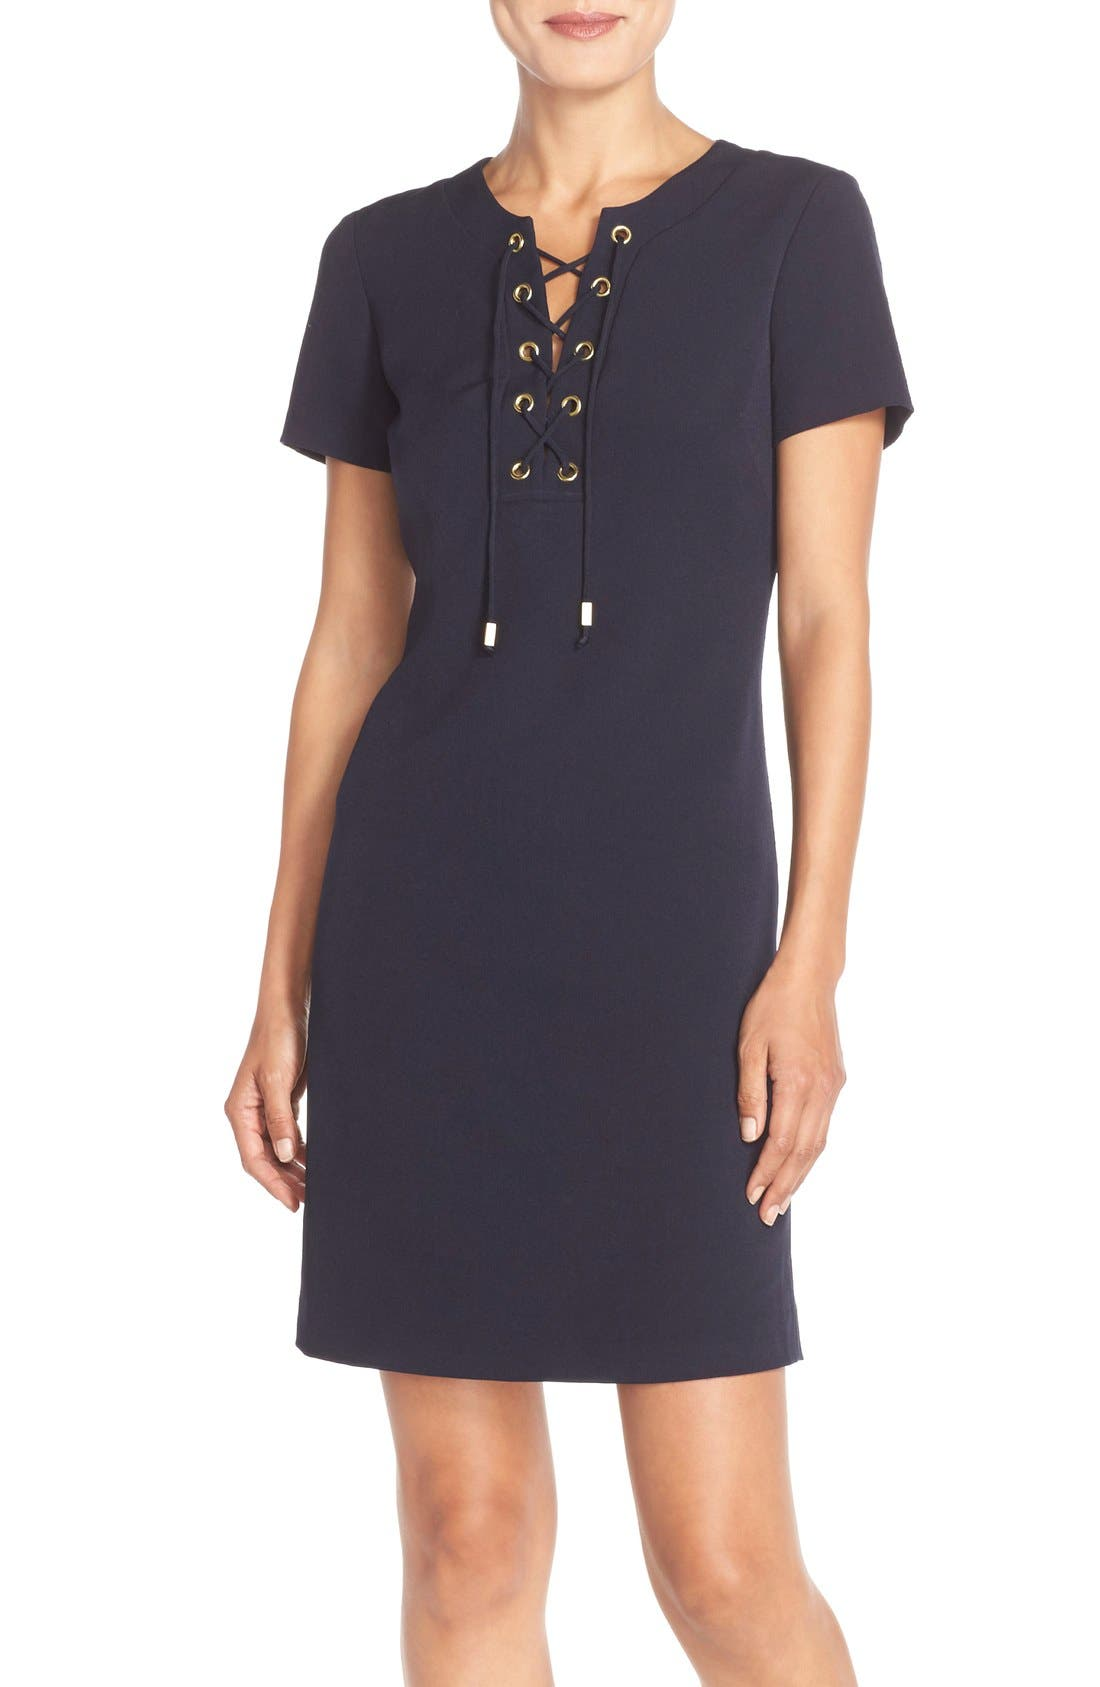 Alternate Image 1 Selected - Eliza J Front Lace Shift Dress (Regular & Petite)